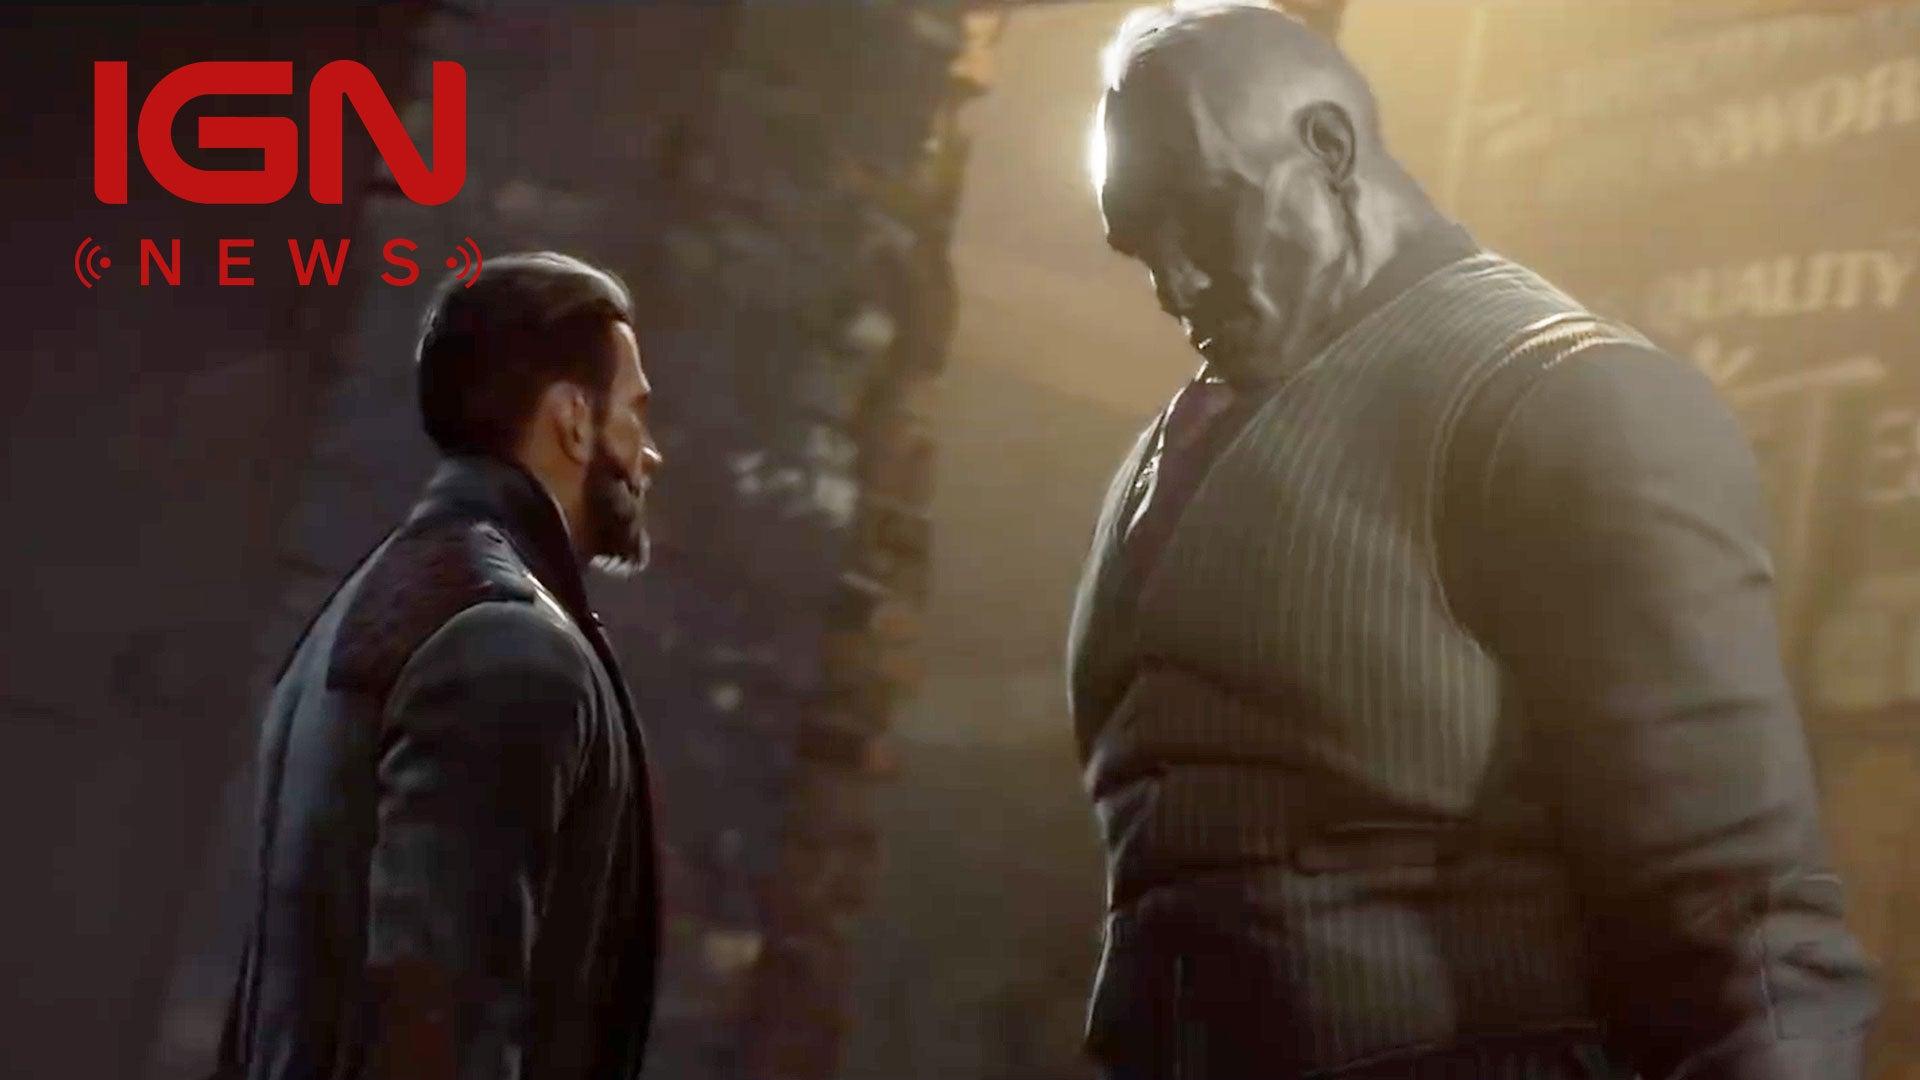 Vampyr Videos Movies  Trailers  PC  IGN